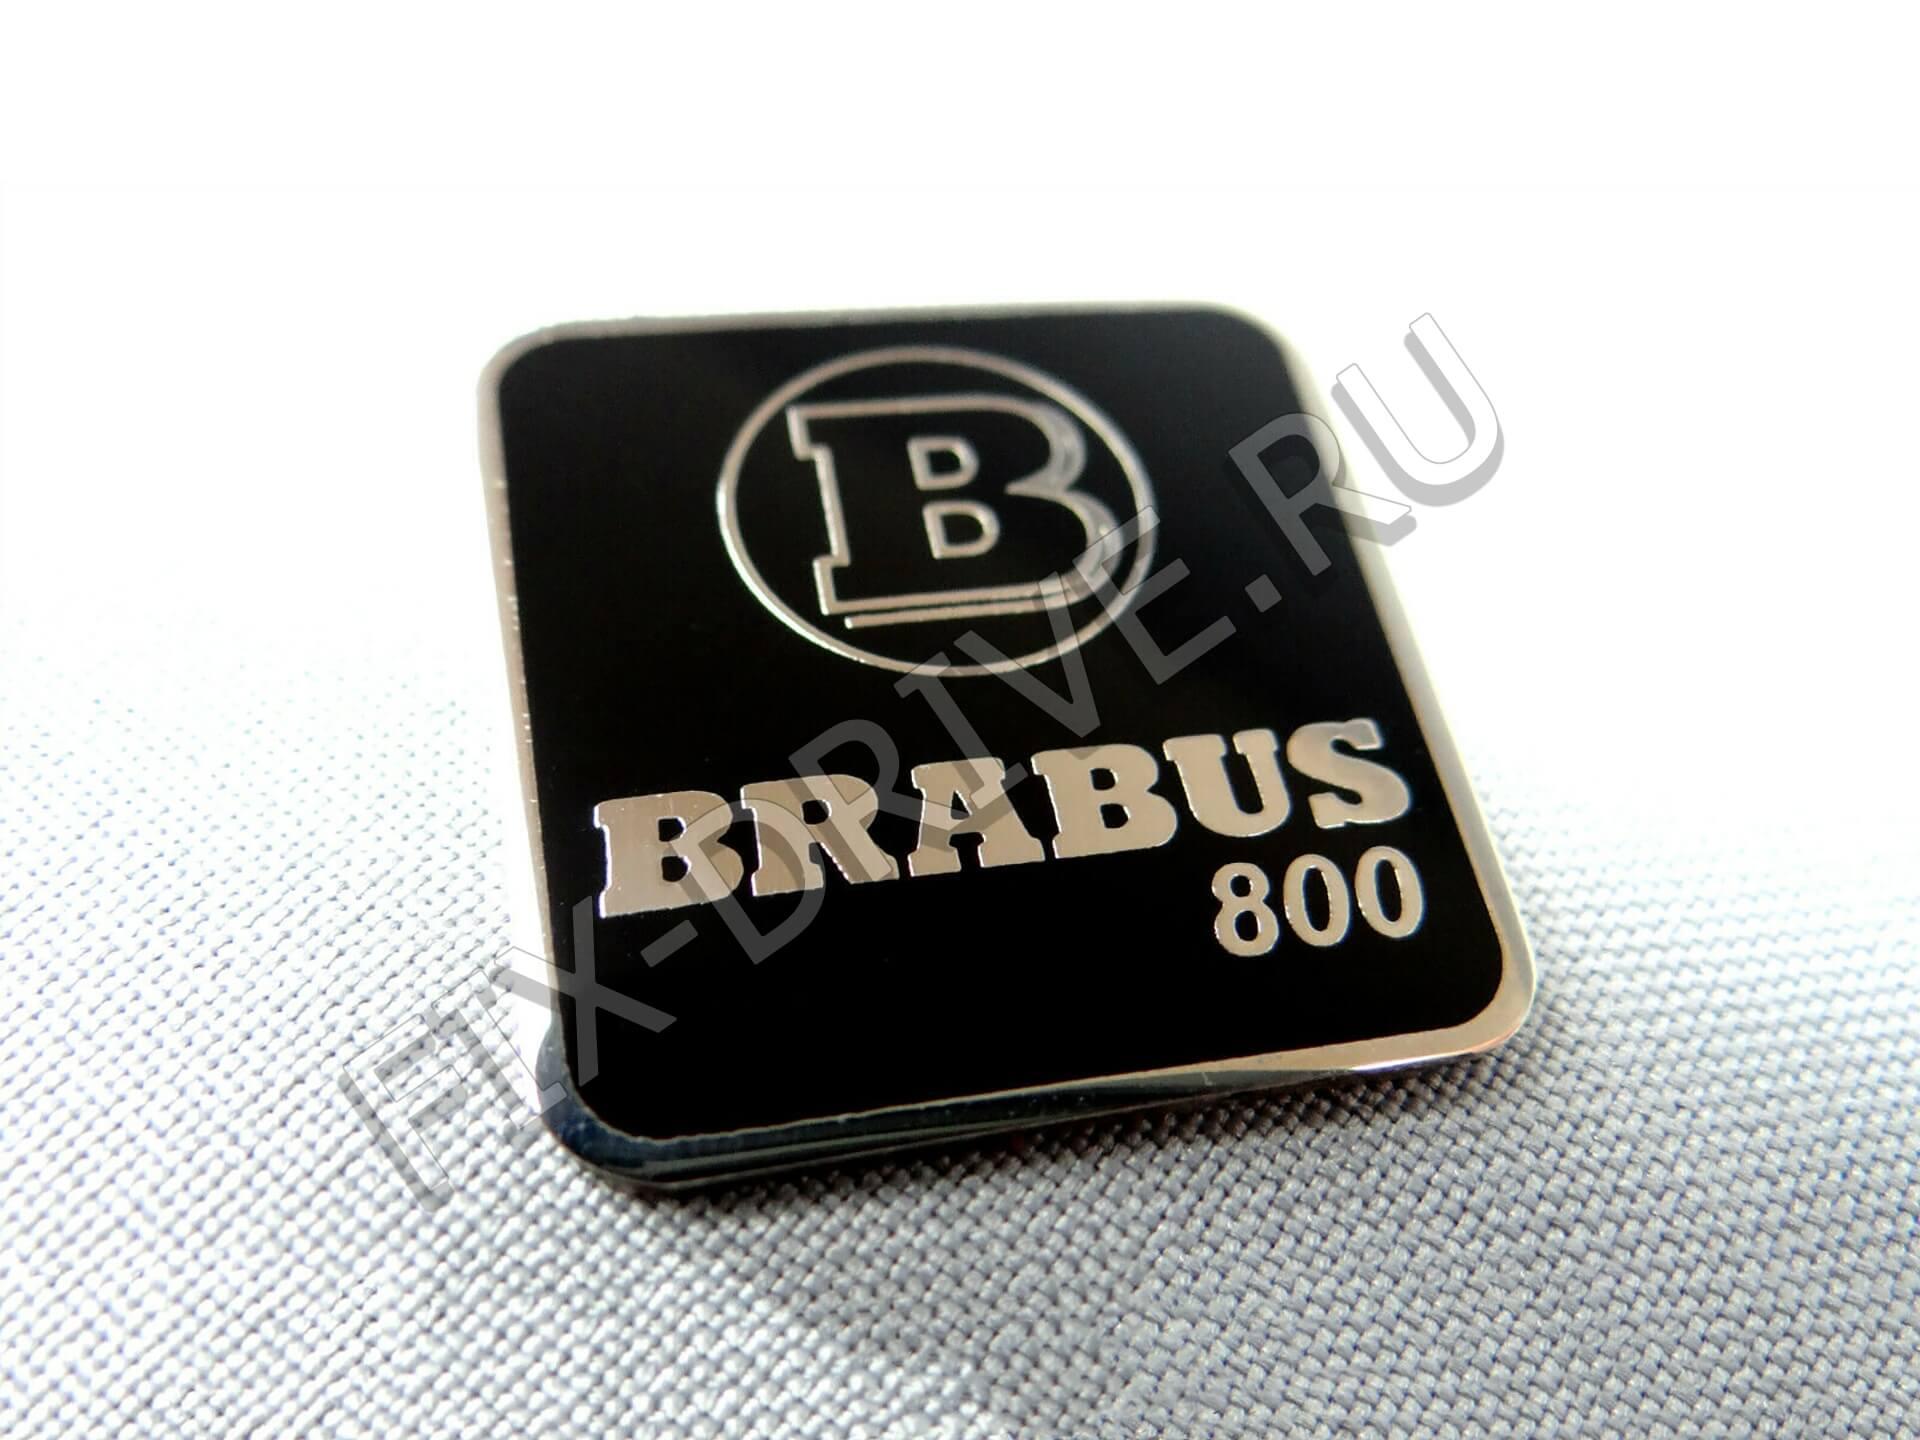 Эмблема Brabus 800 250мм квадратная